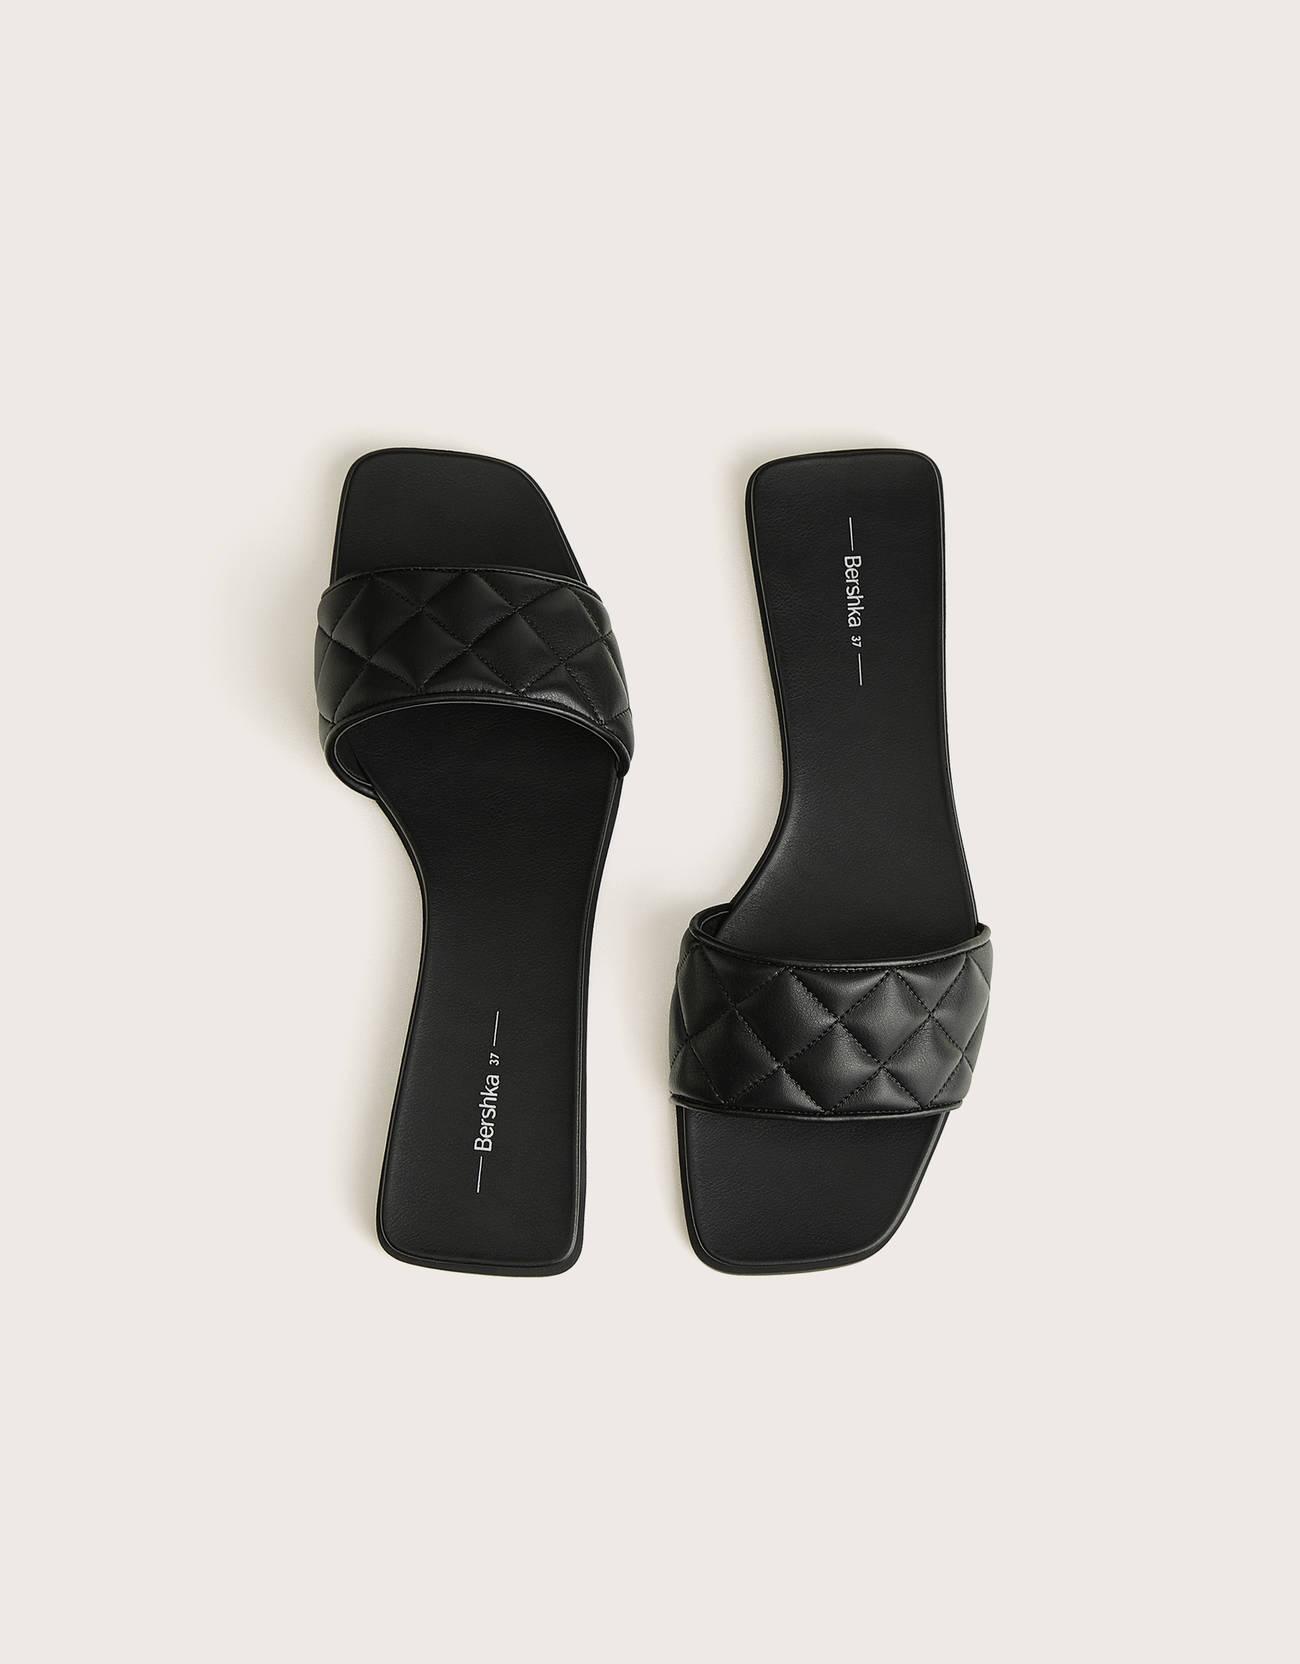 Sandalias pala negras acolchadas